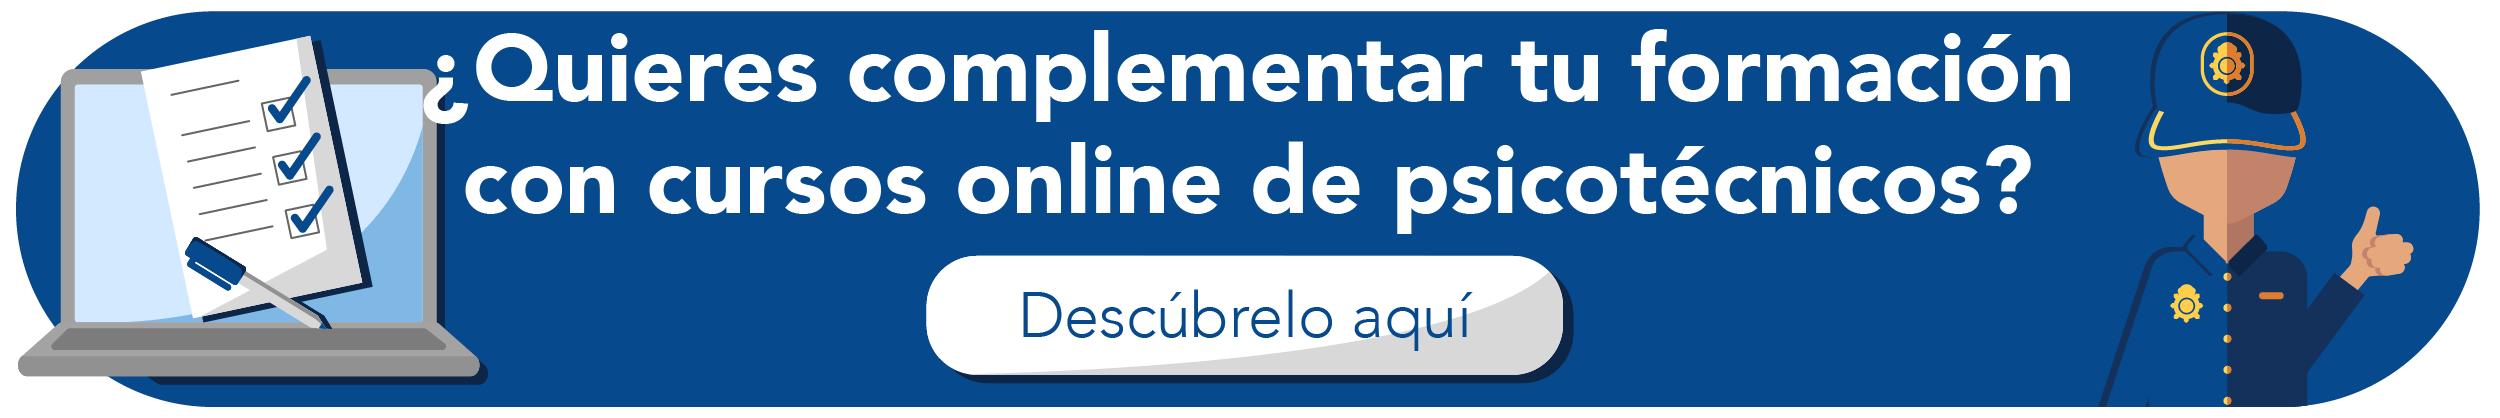 Cursos Online psicotécnicos Policía Nacional